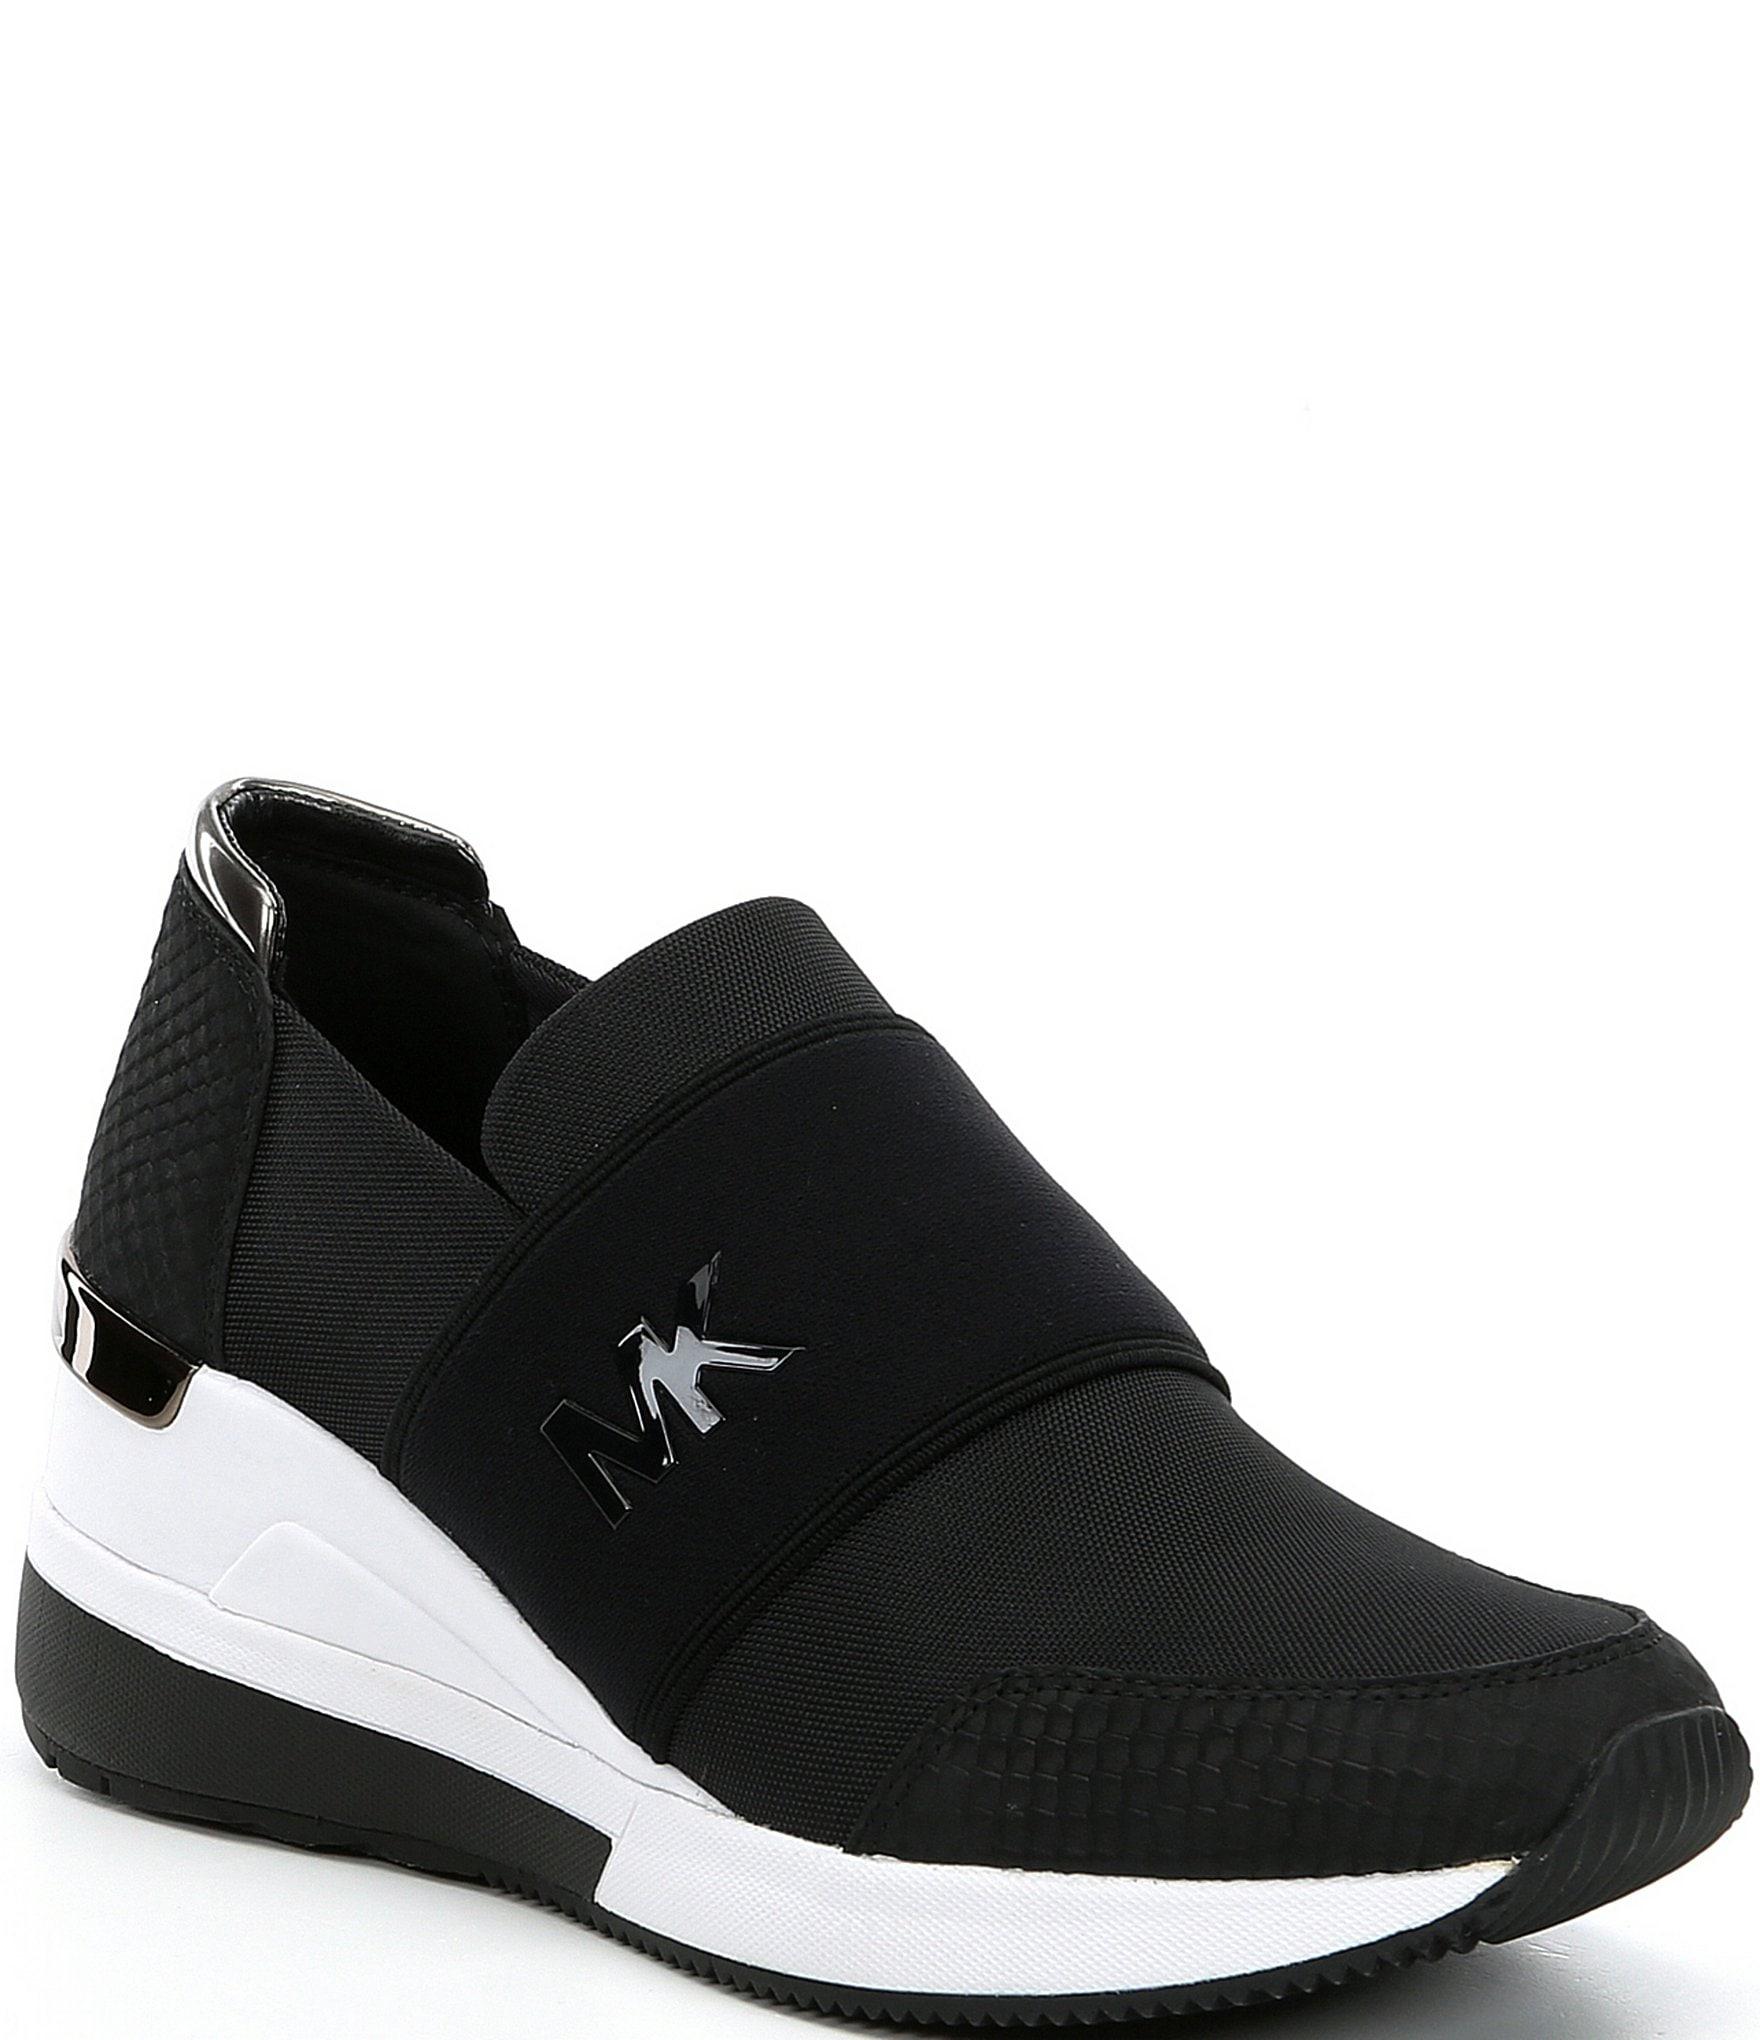 buy online 6e891 30b3c Women s Athletic Shoes   Dillard s